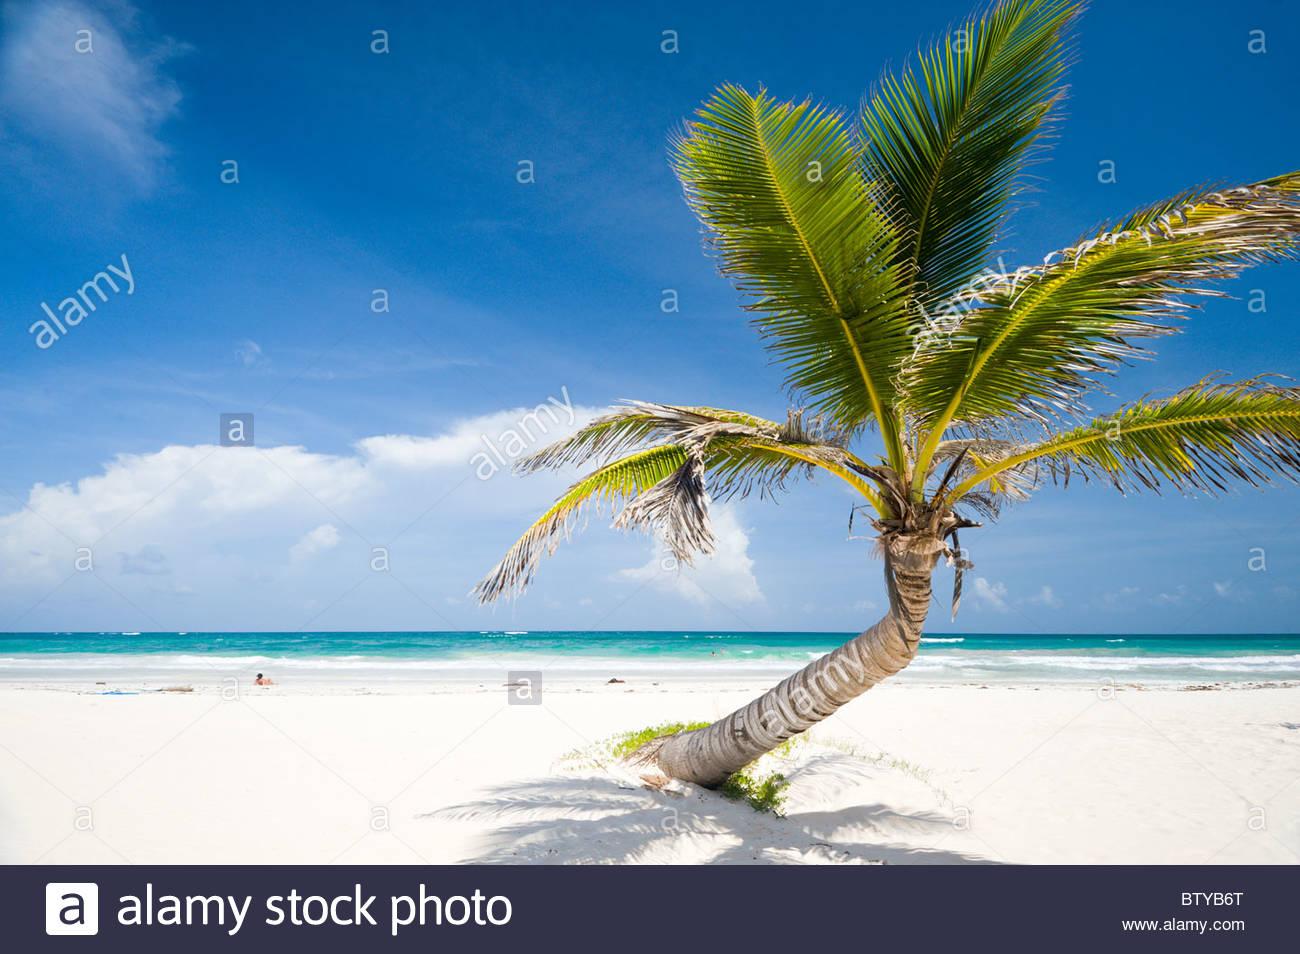 Palme am Strand von Tulum, Quintana Roo, Halbinsel Yucatan, Mexiko. Stockbild